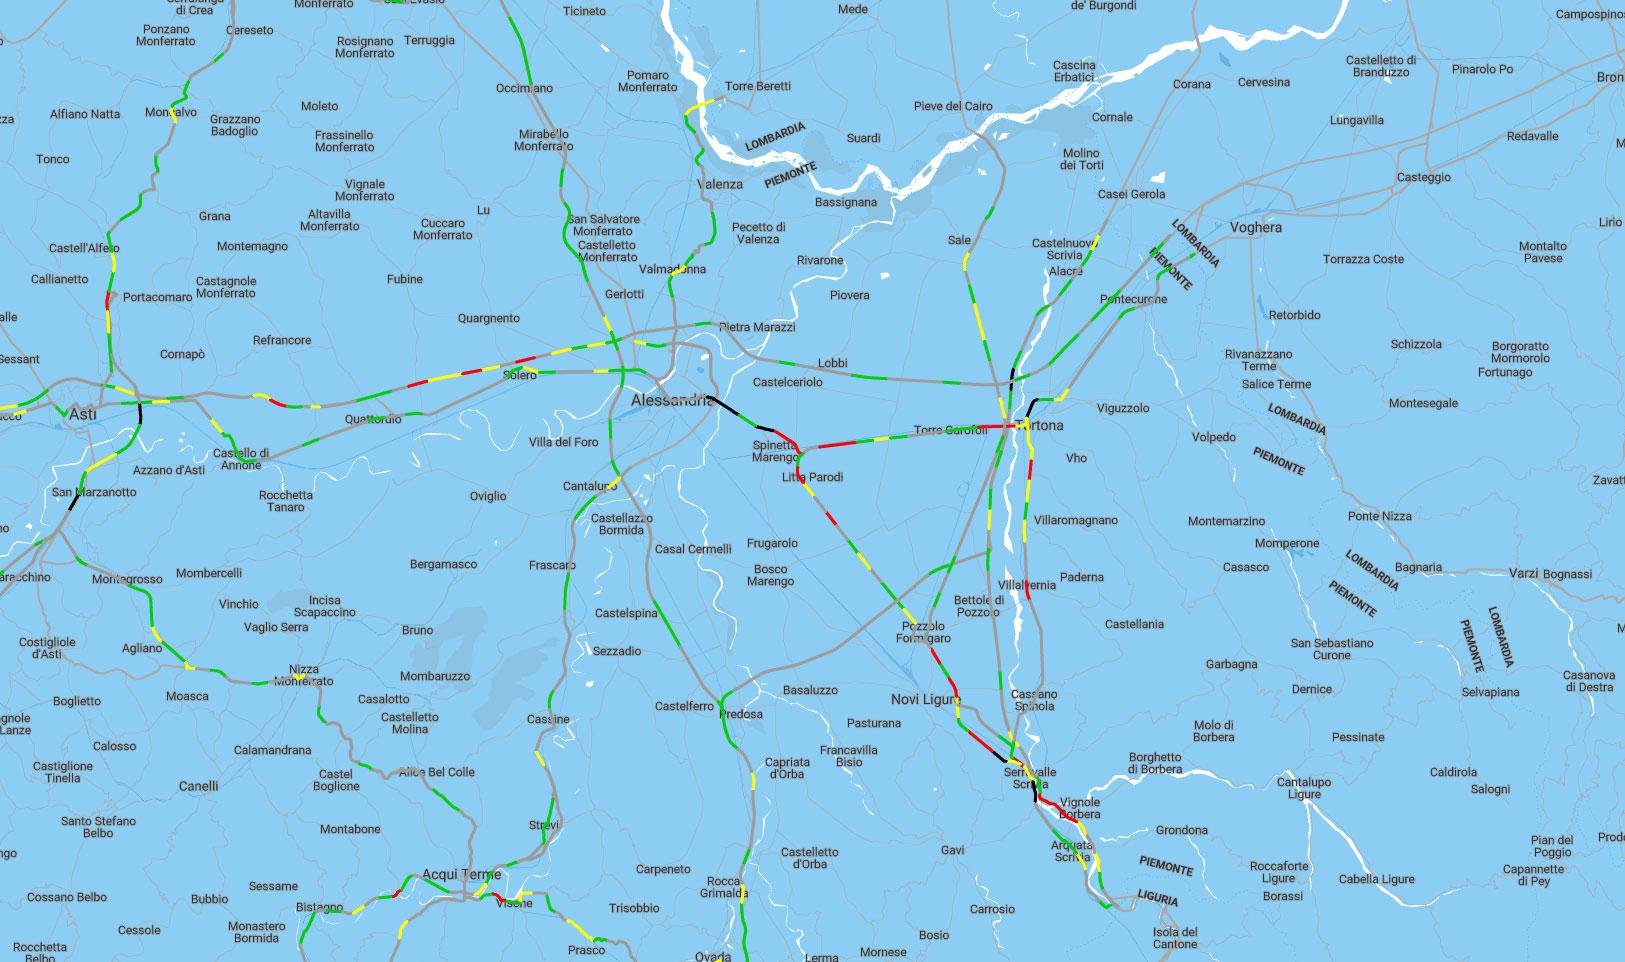 Mappa incidenti 2018